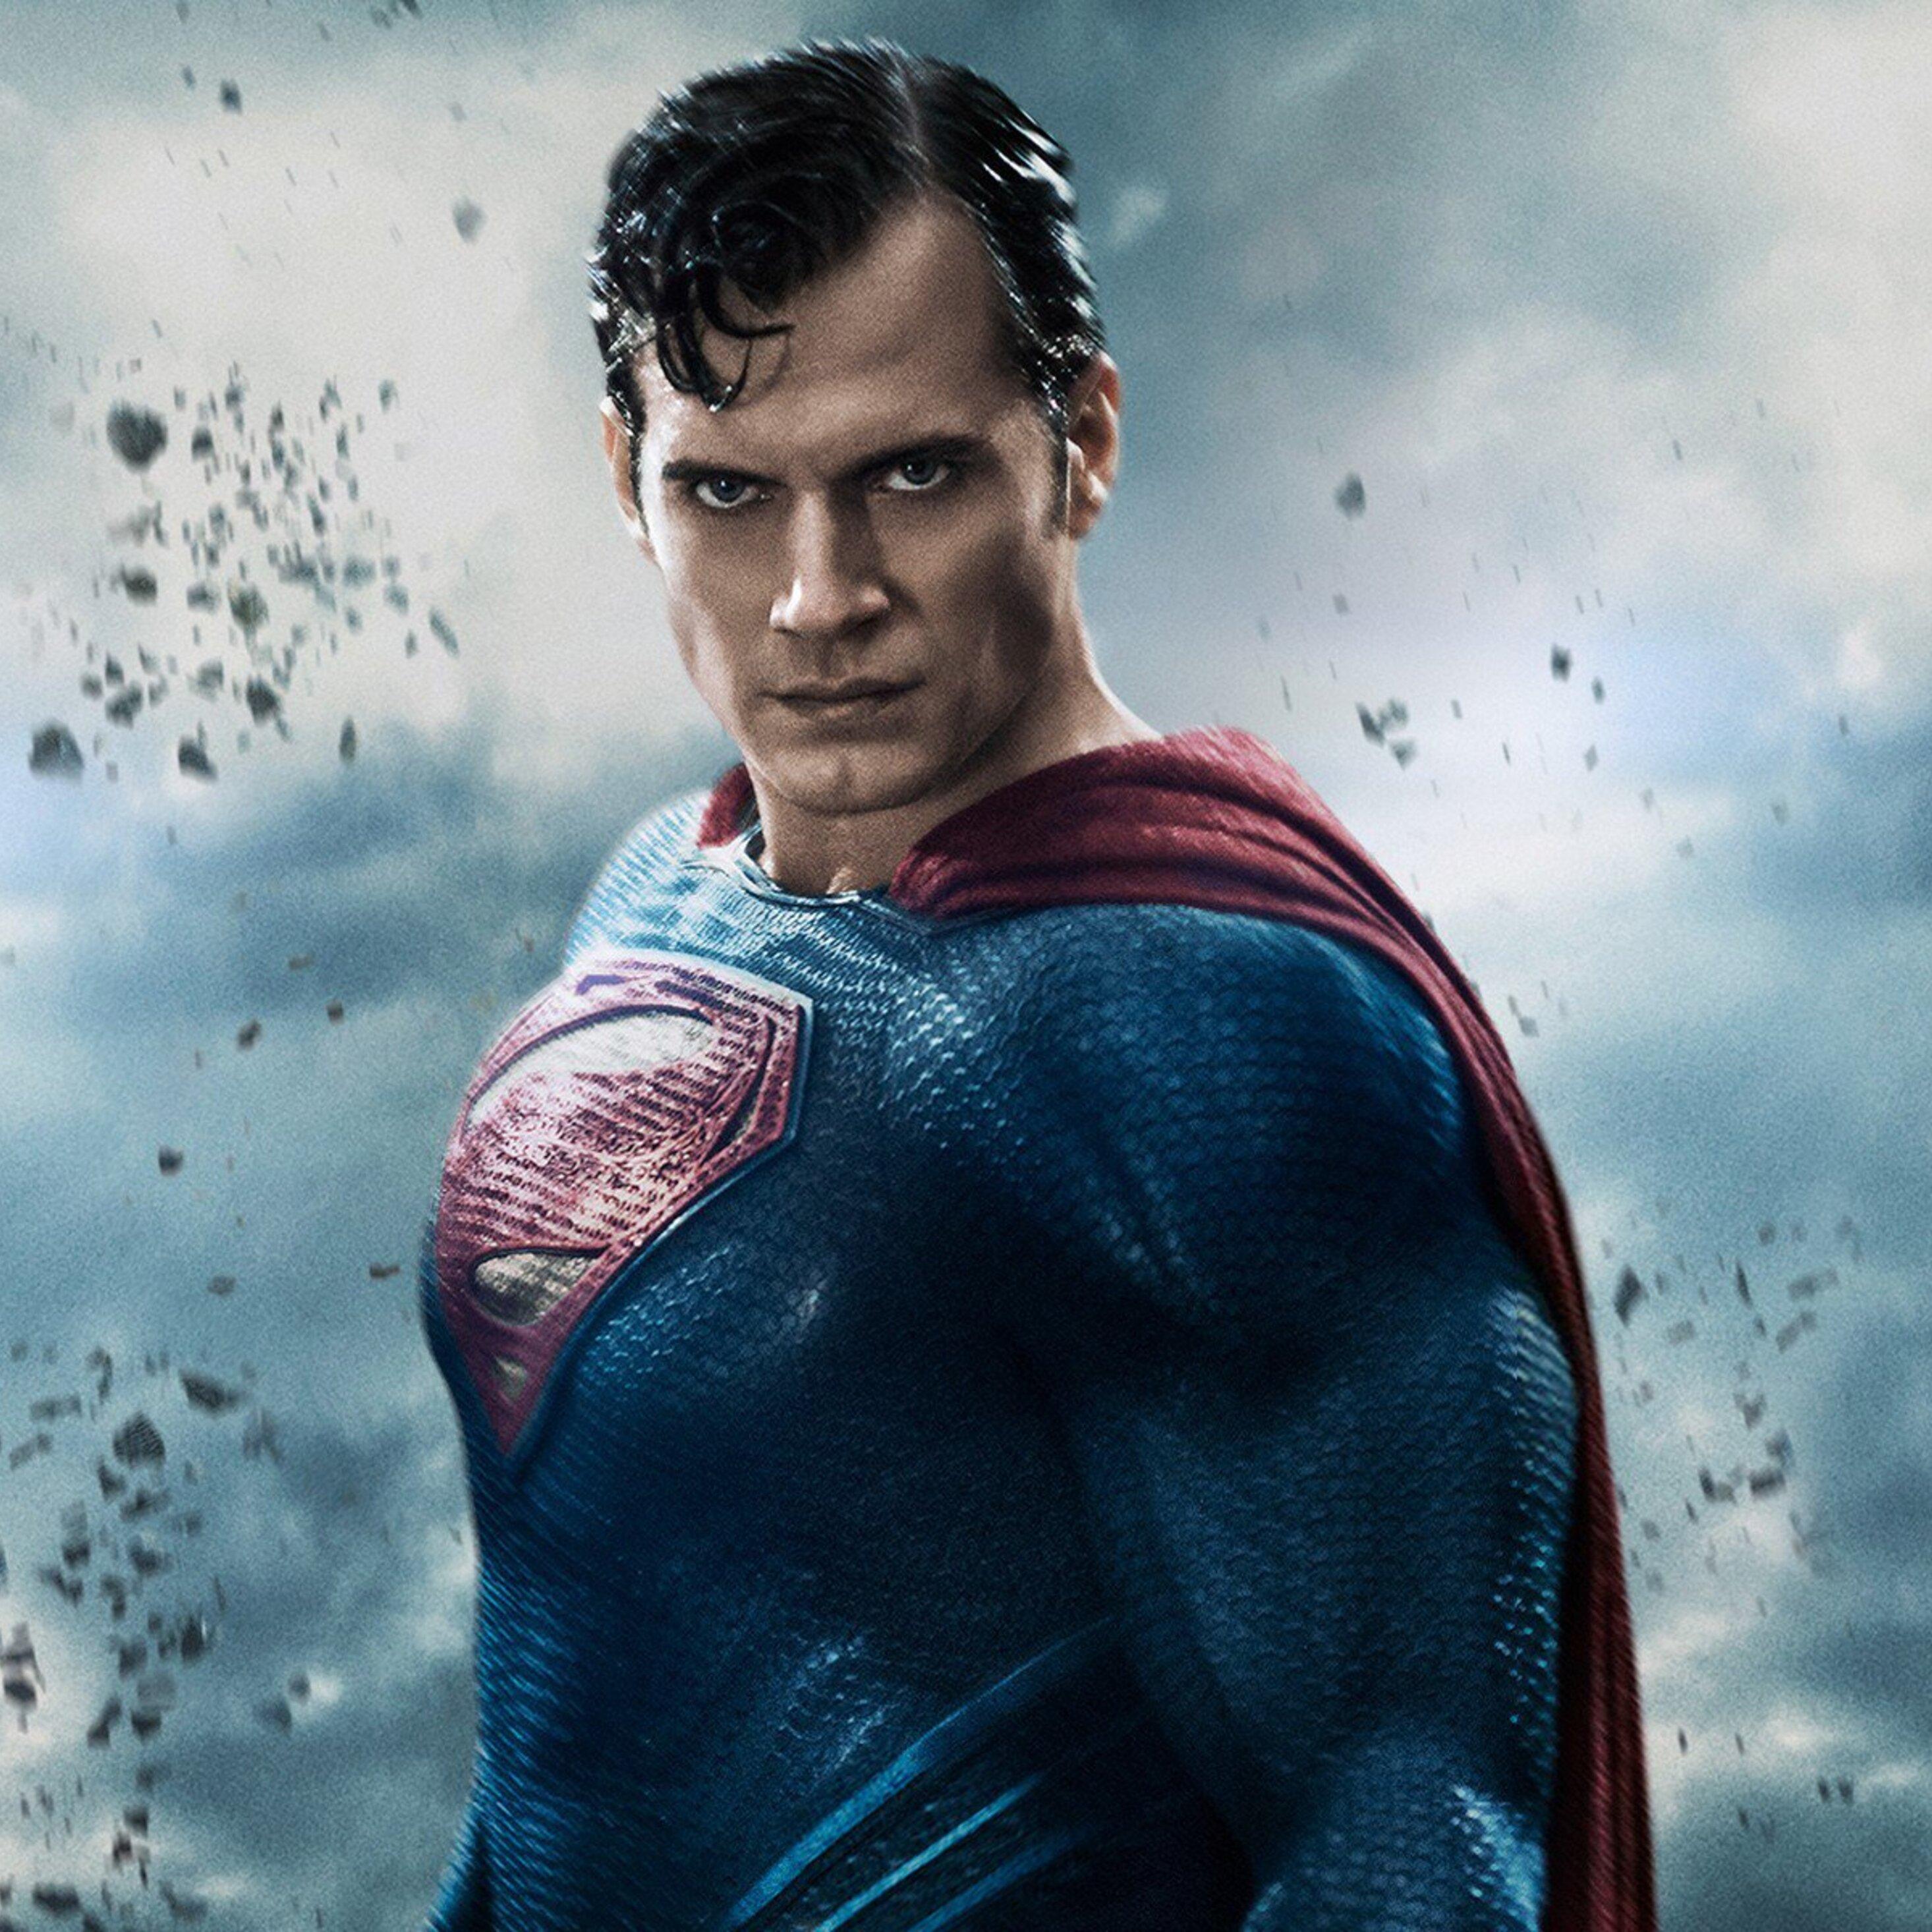 2932x2932 henry cavill in batman vs superman movie ipad - Super batman movie ...